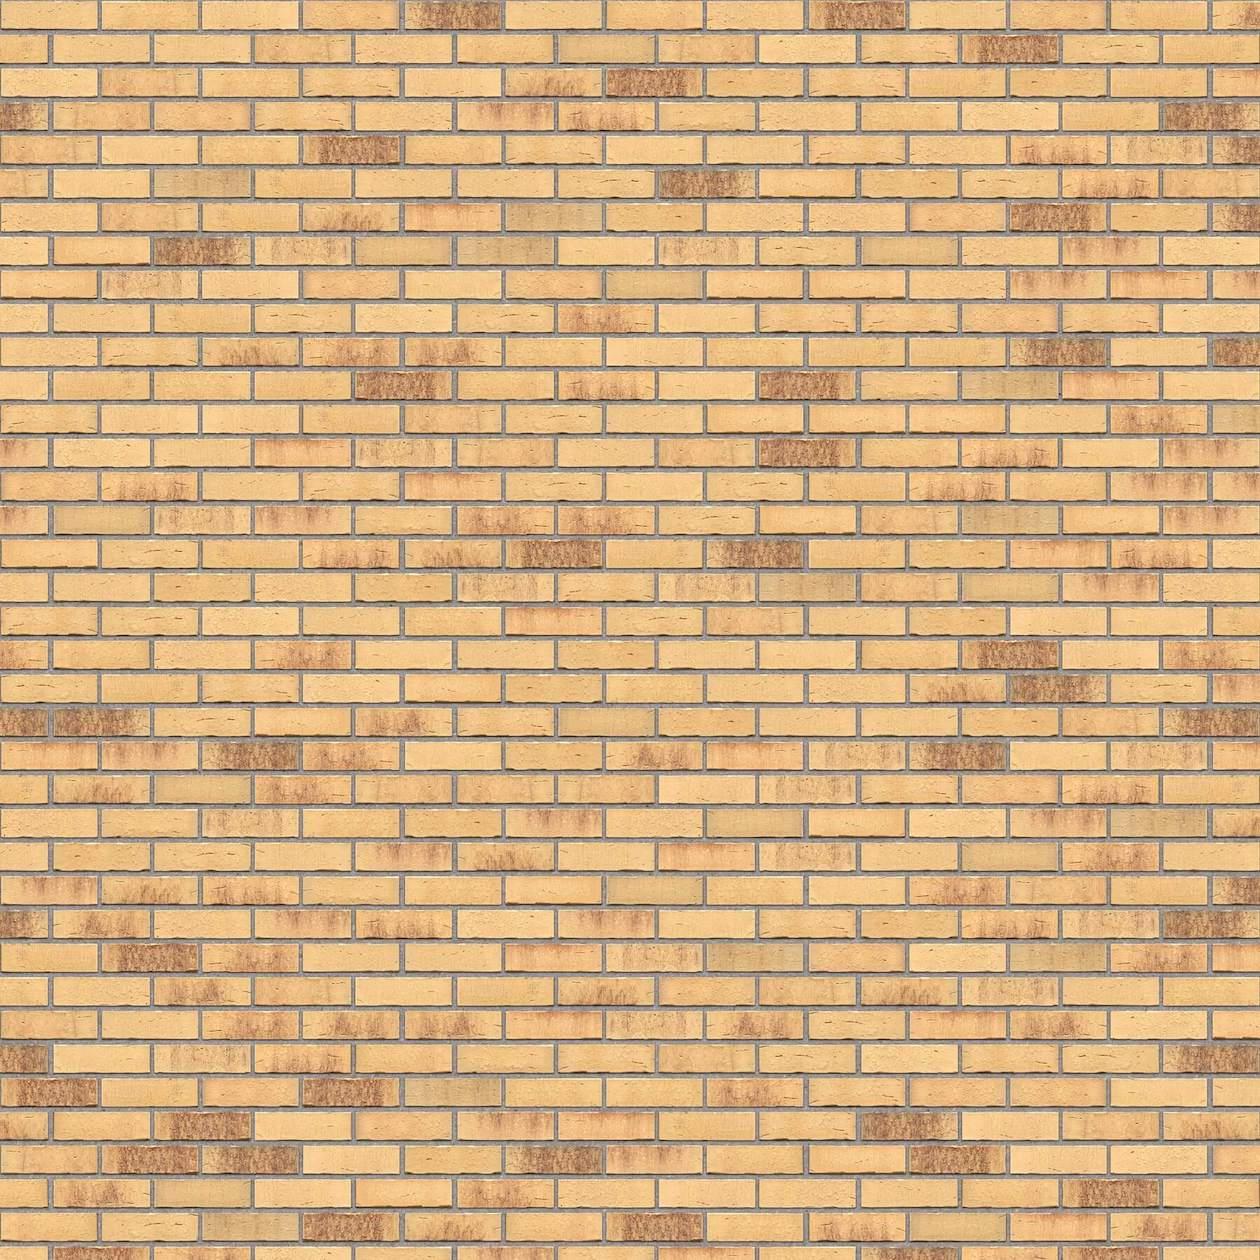 Puna-cigla-FeldHaus-Klinker-brick-house-nf-k-734-Siva Fuga